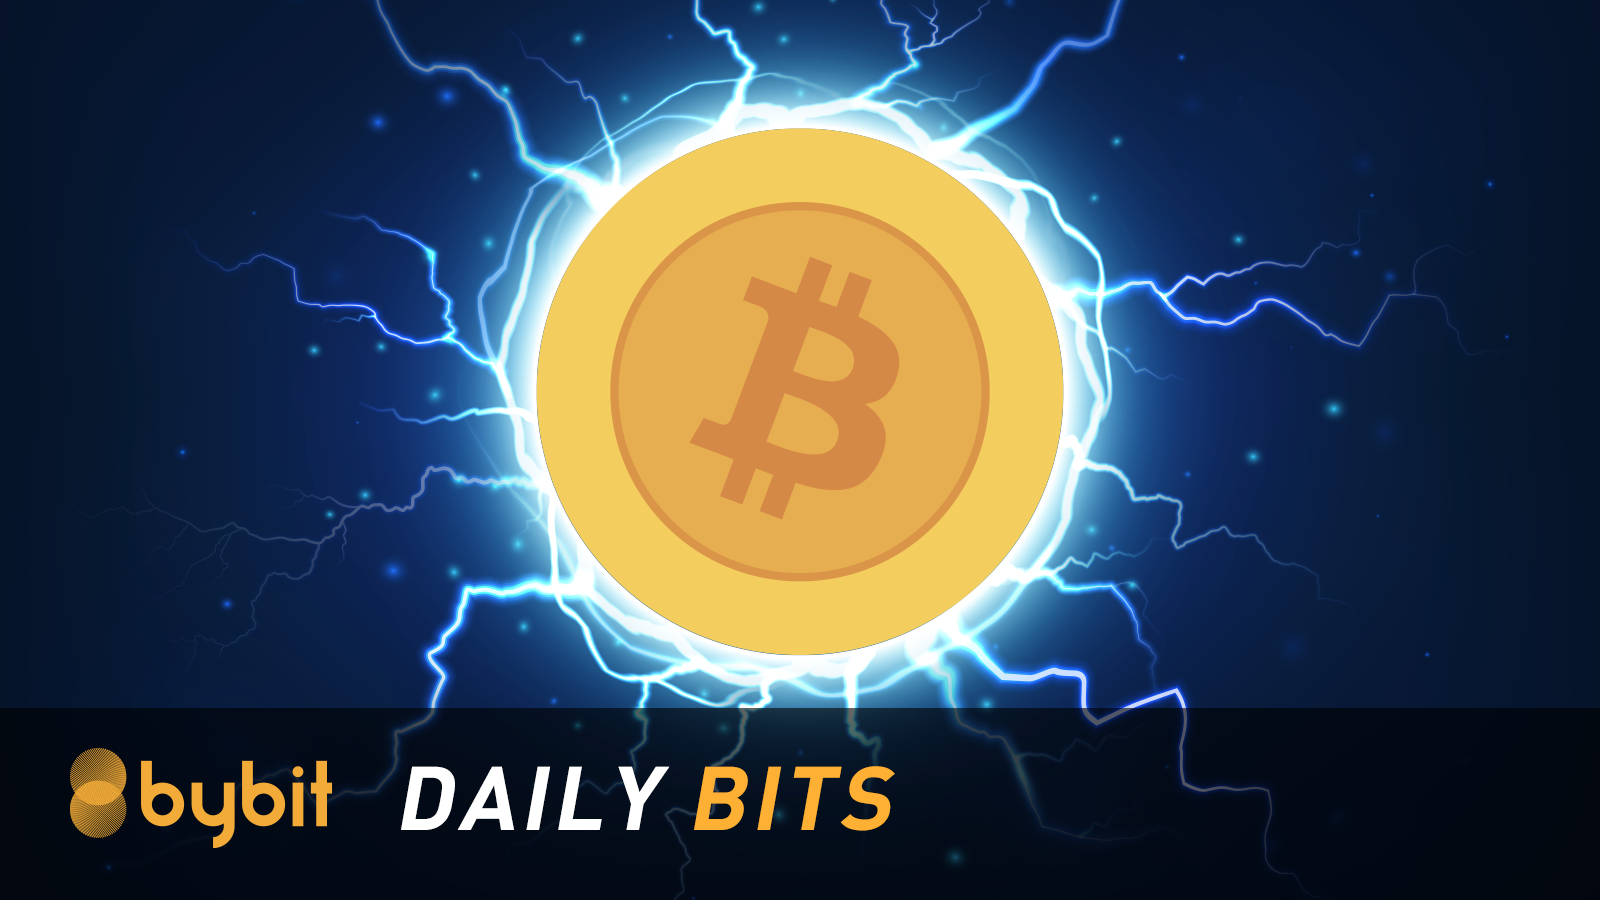 Daily Bits - Lightning network